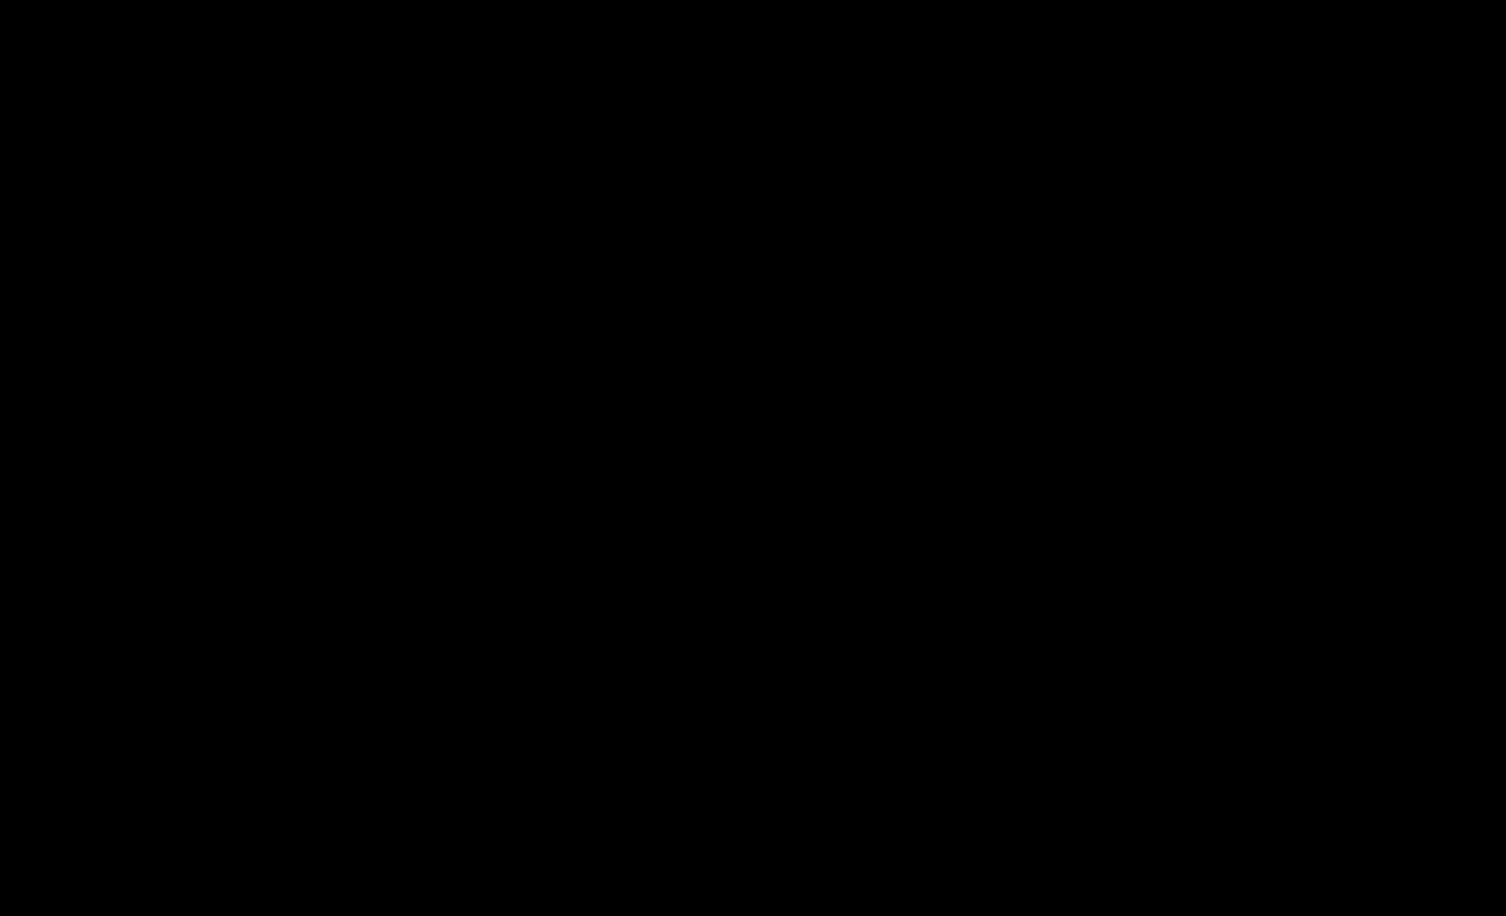 2-[4-(Boc-amino)-1-piperidinyl]-5-bromopyridine